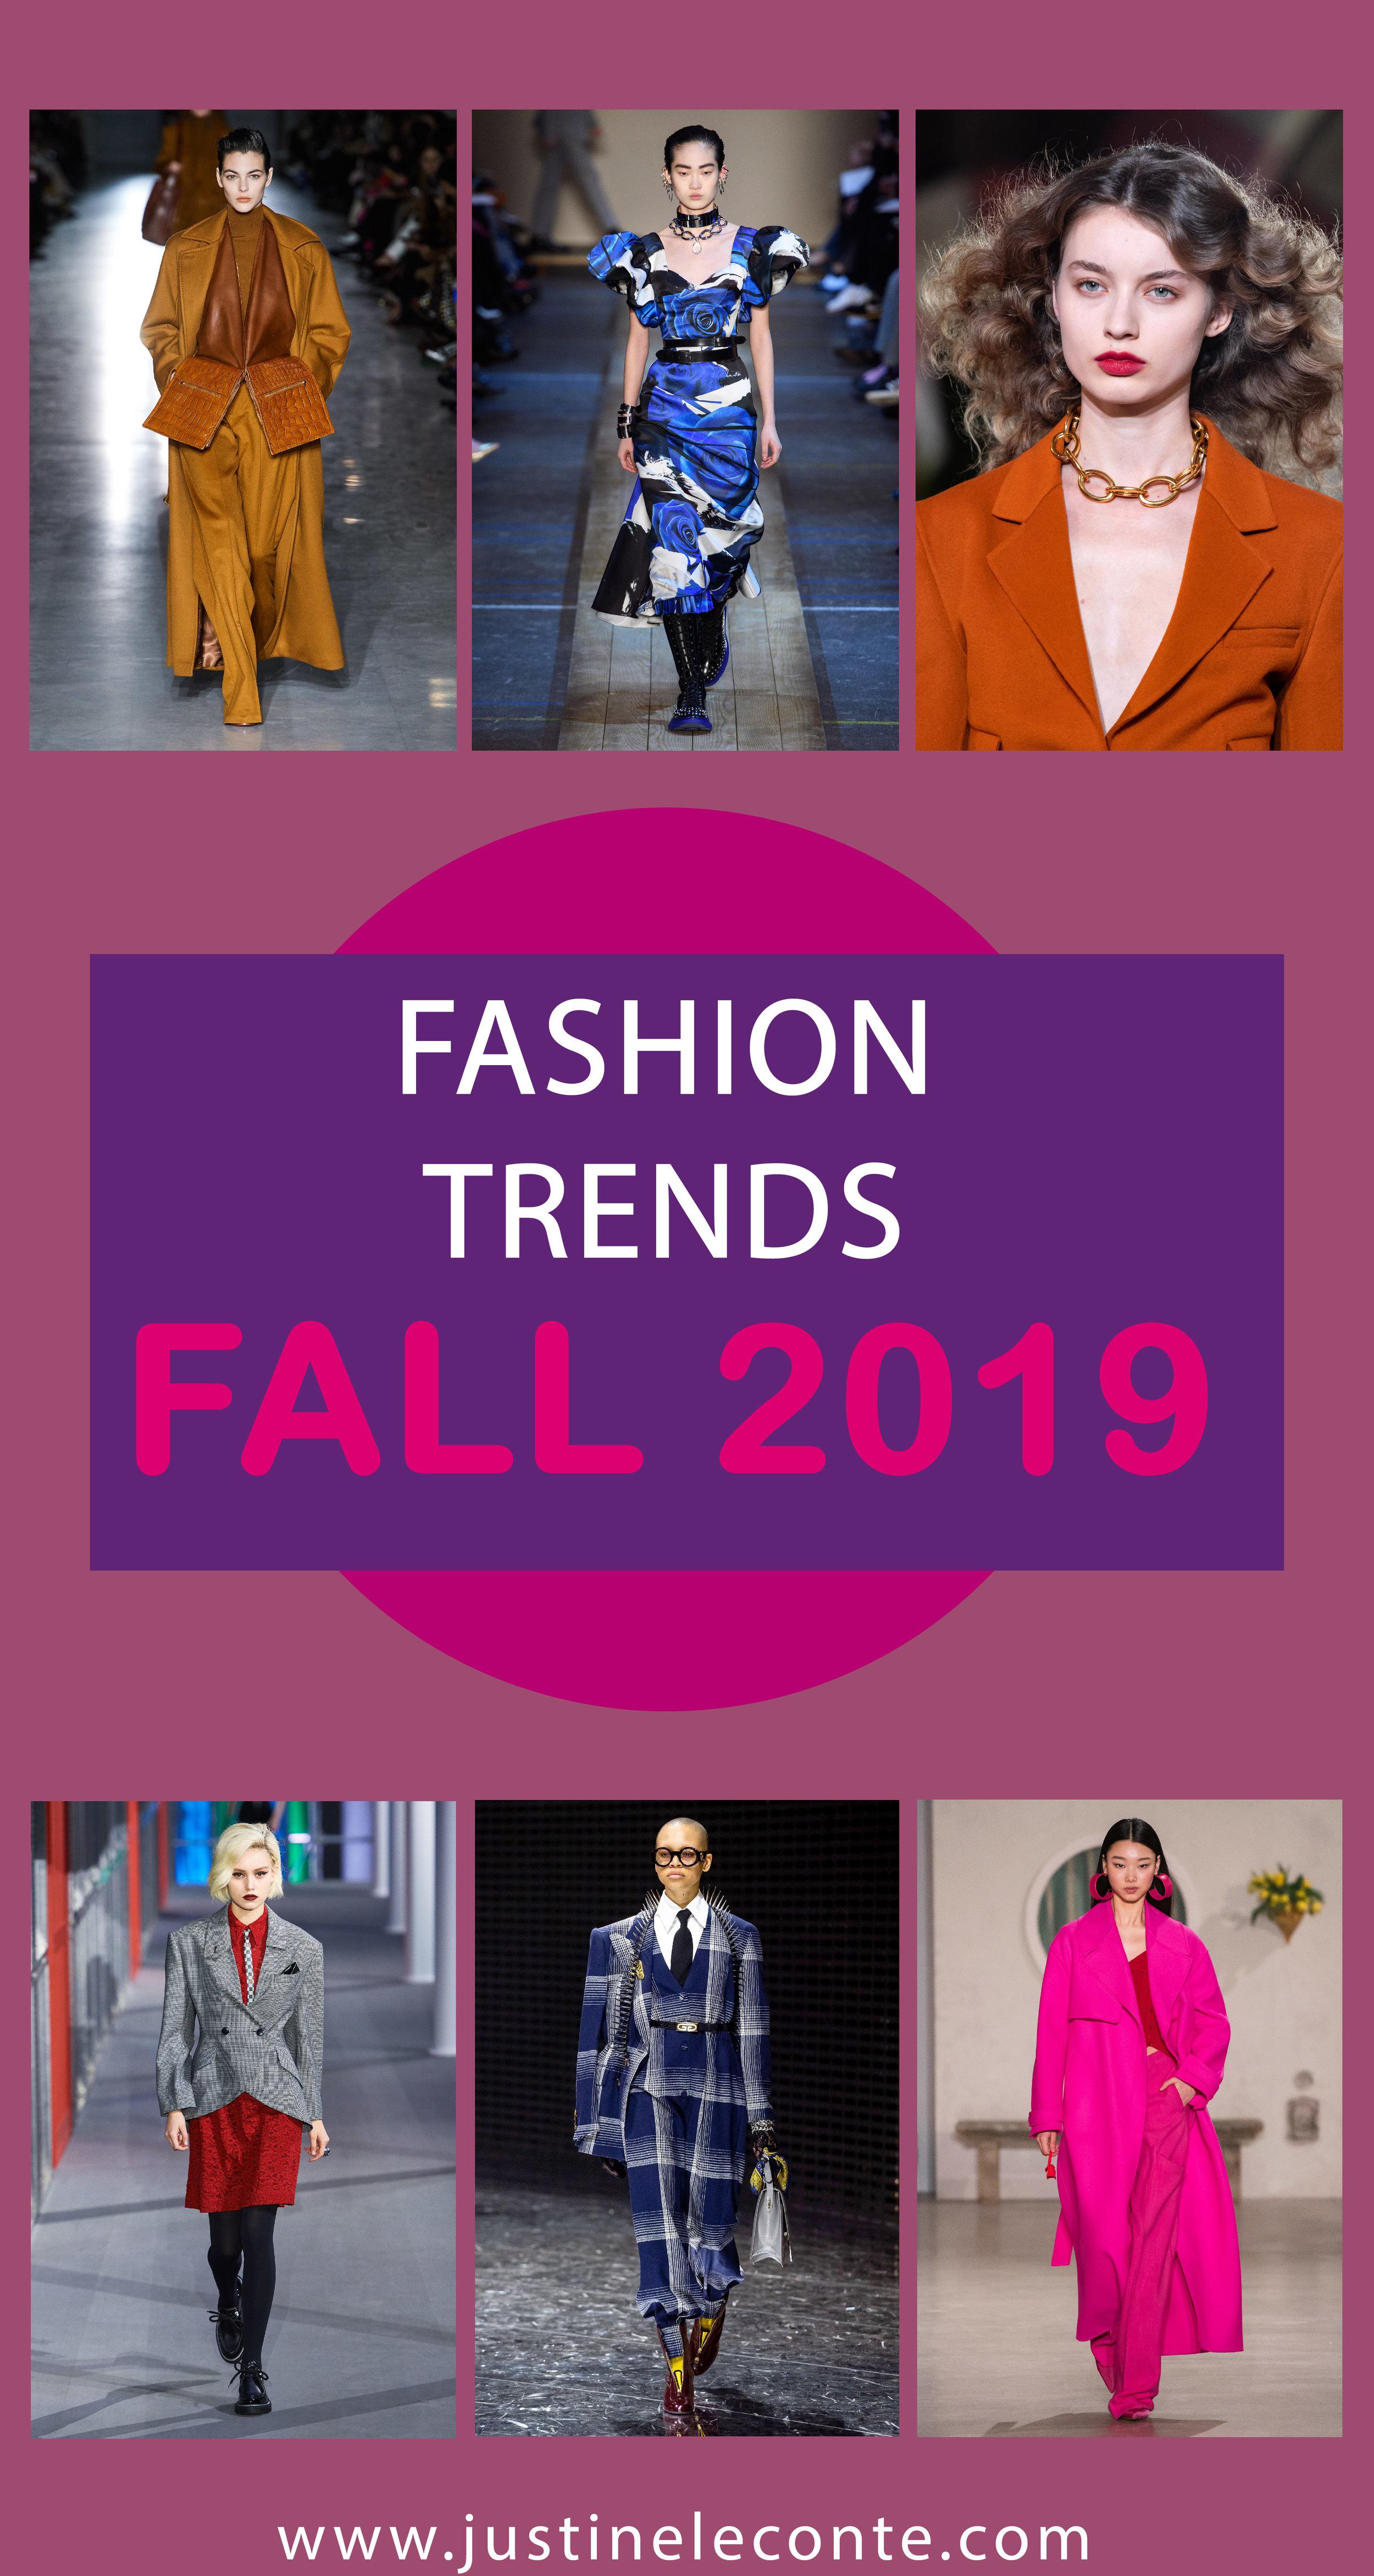 20190905_Fashion-trends-fall-winter-2019_Justine-Leconte-02.jpg